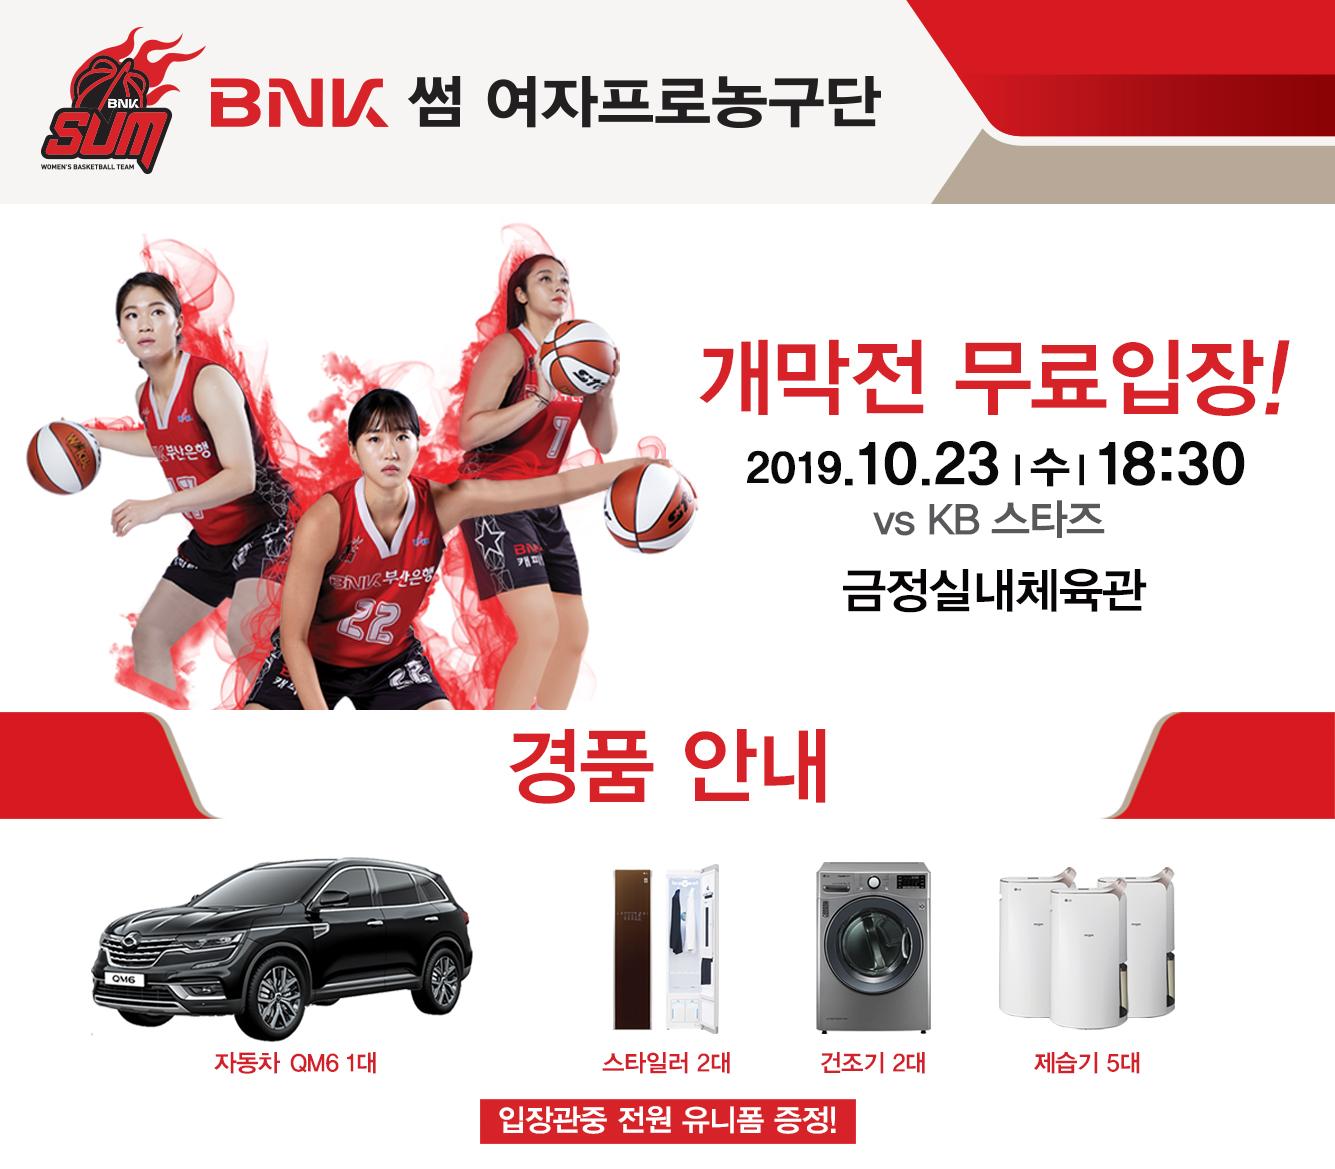 BNK 썸 여자프로농구단 개막전 안내